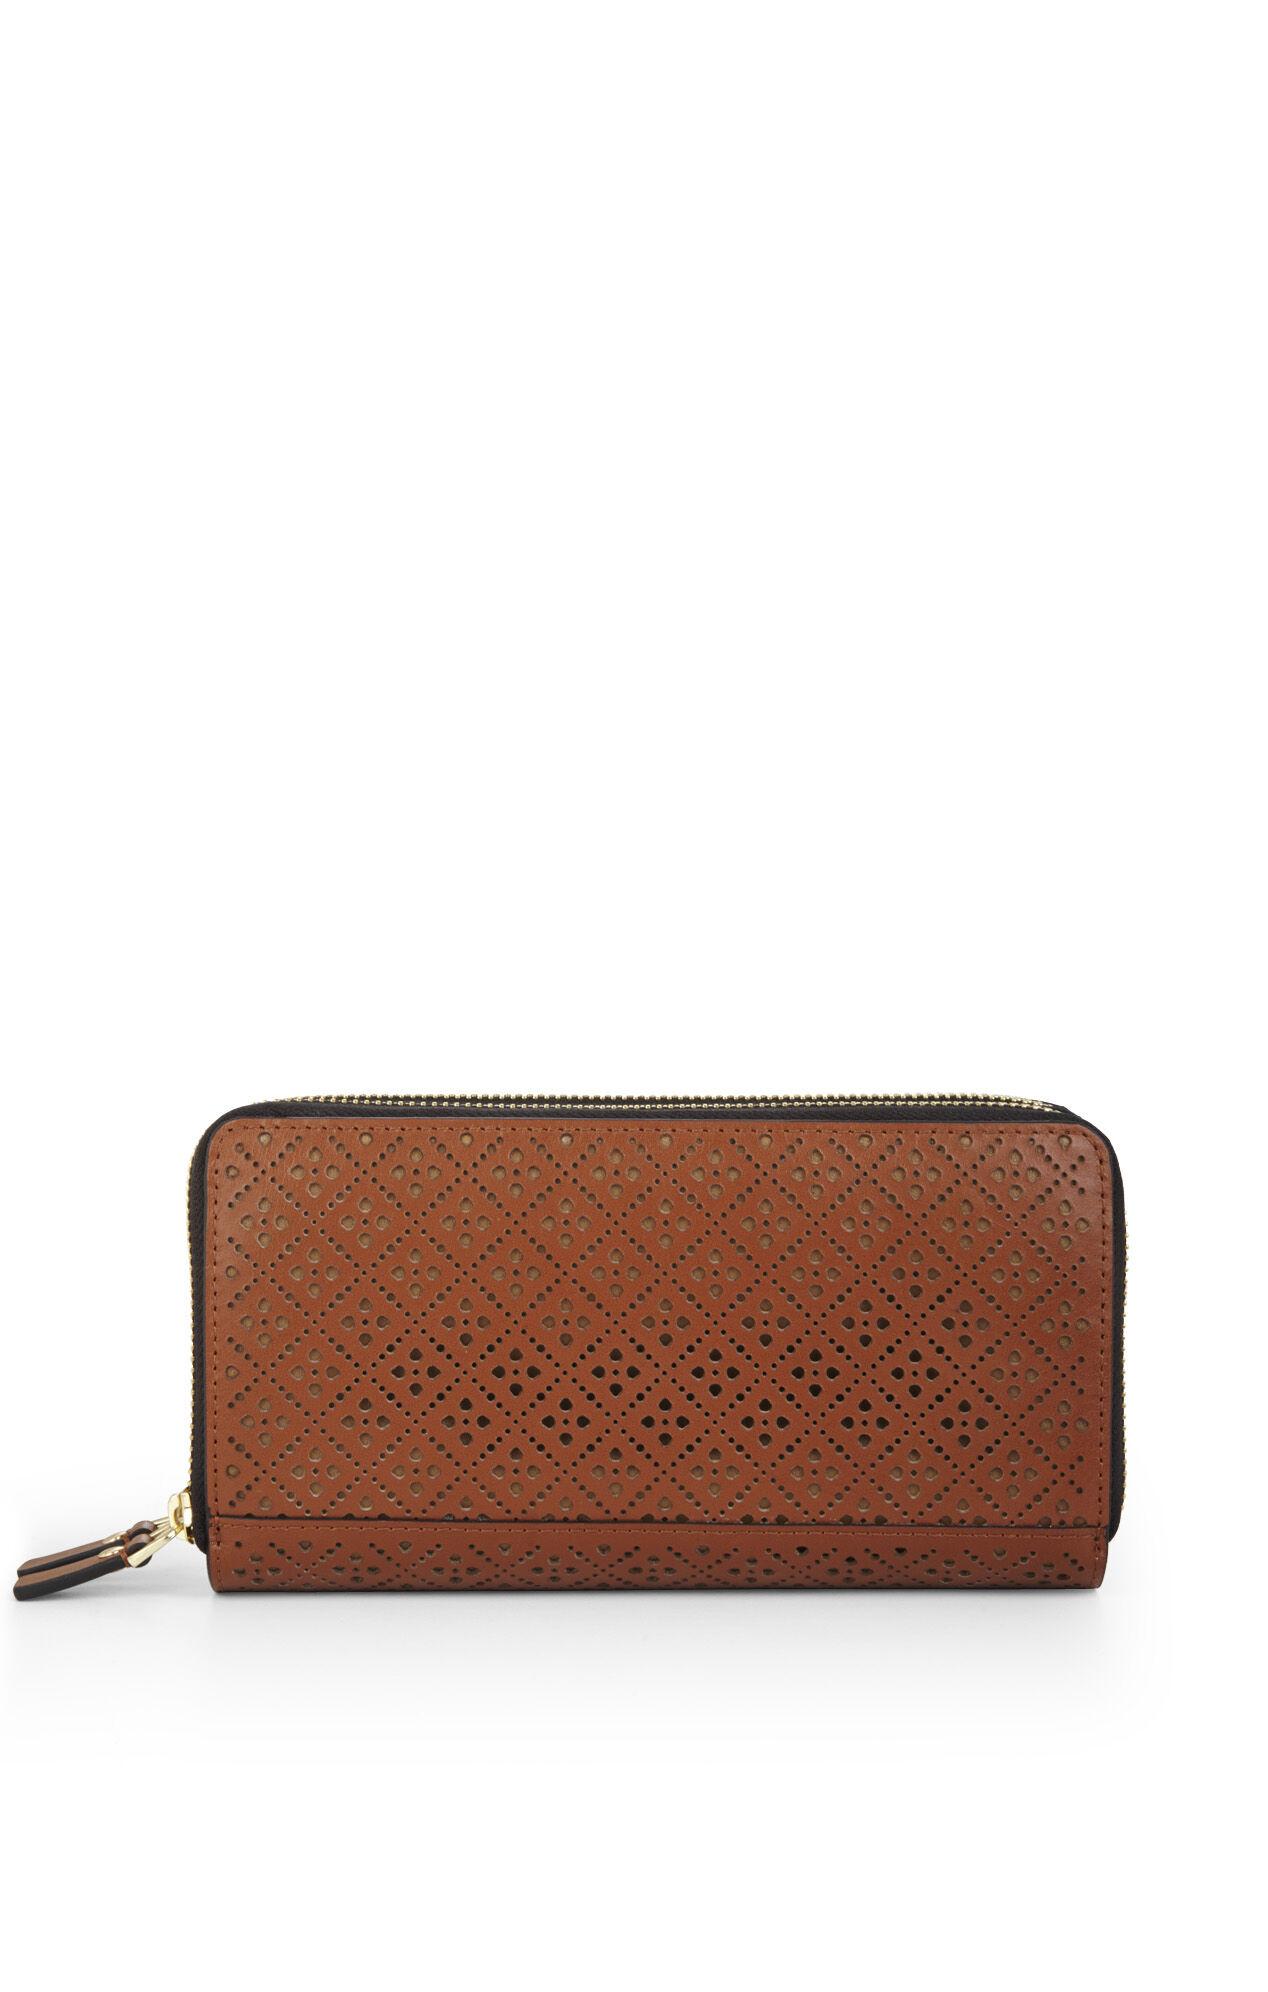 Kaya Lazer-Cut Double Zip-Around Wallet